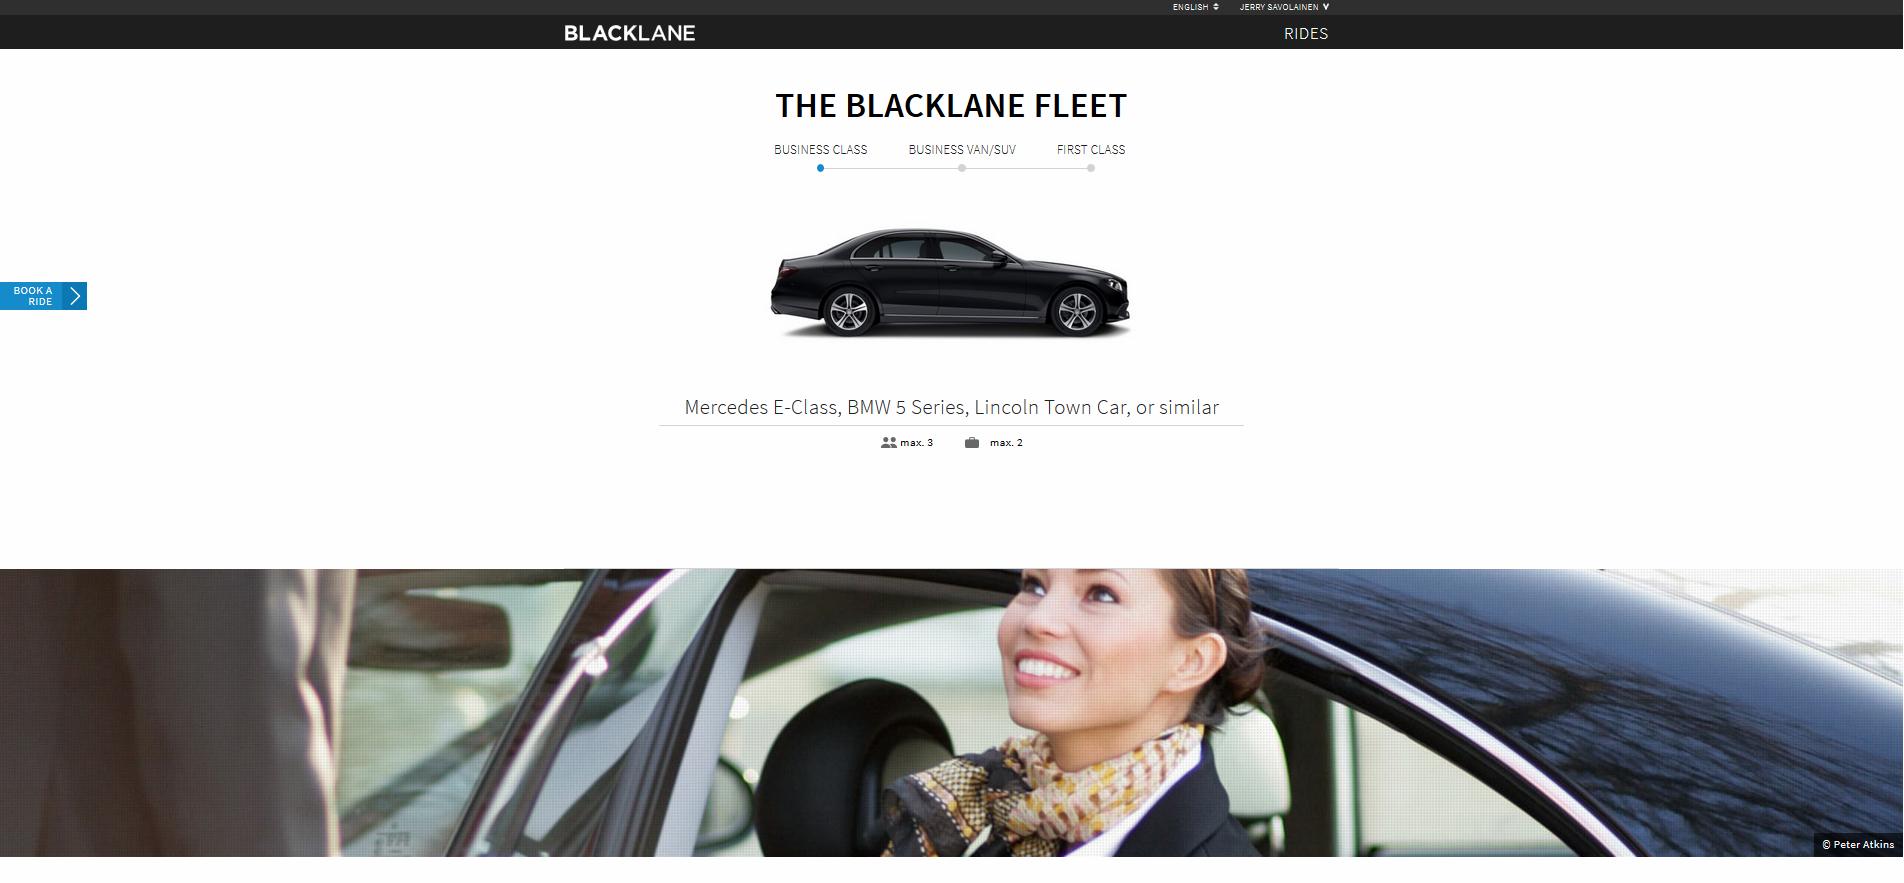 Blacklane3